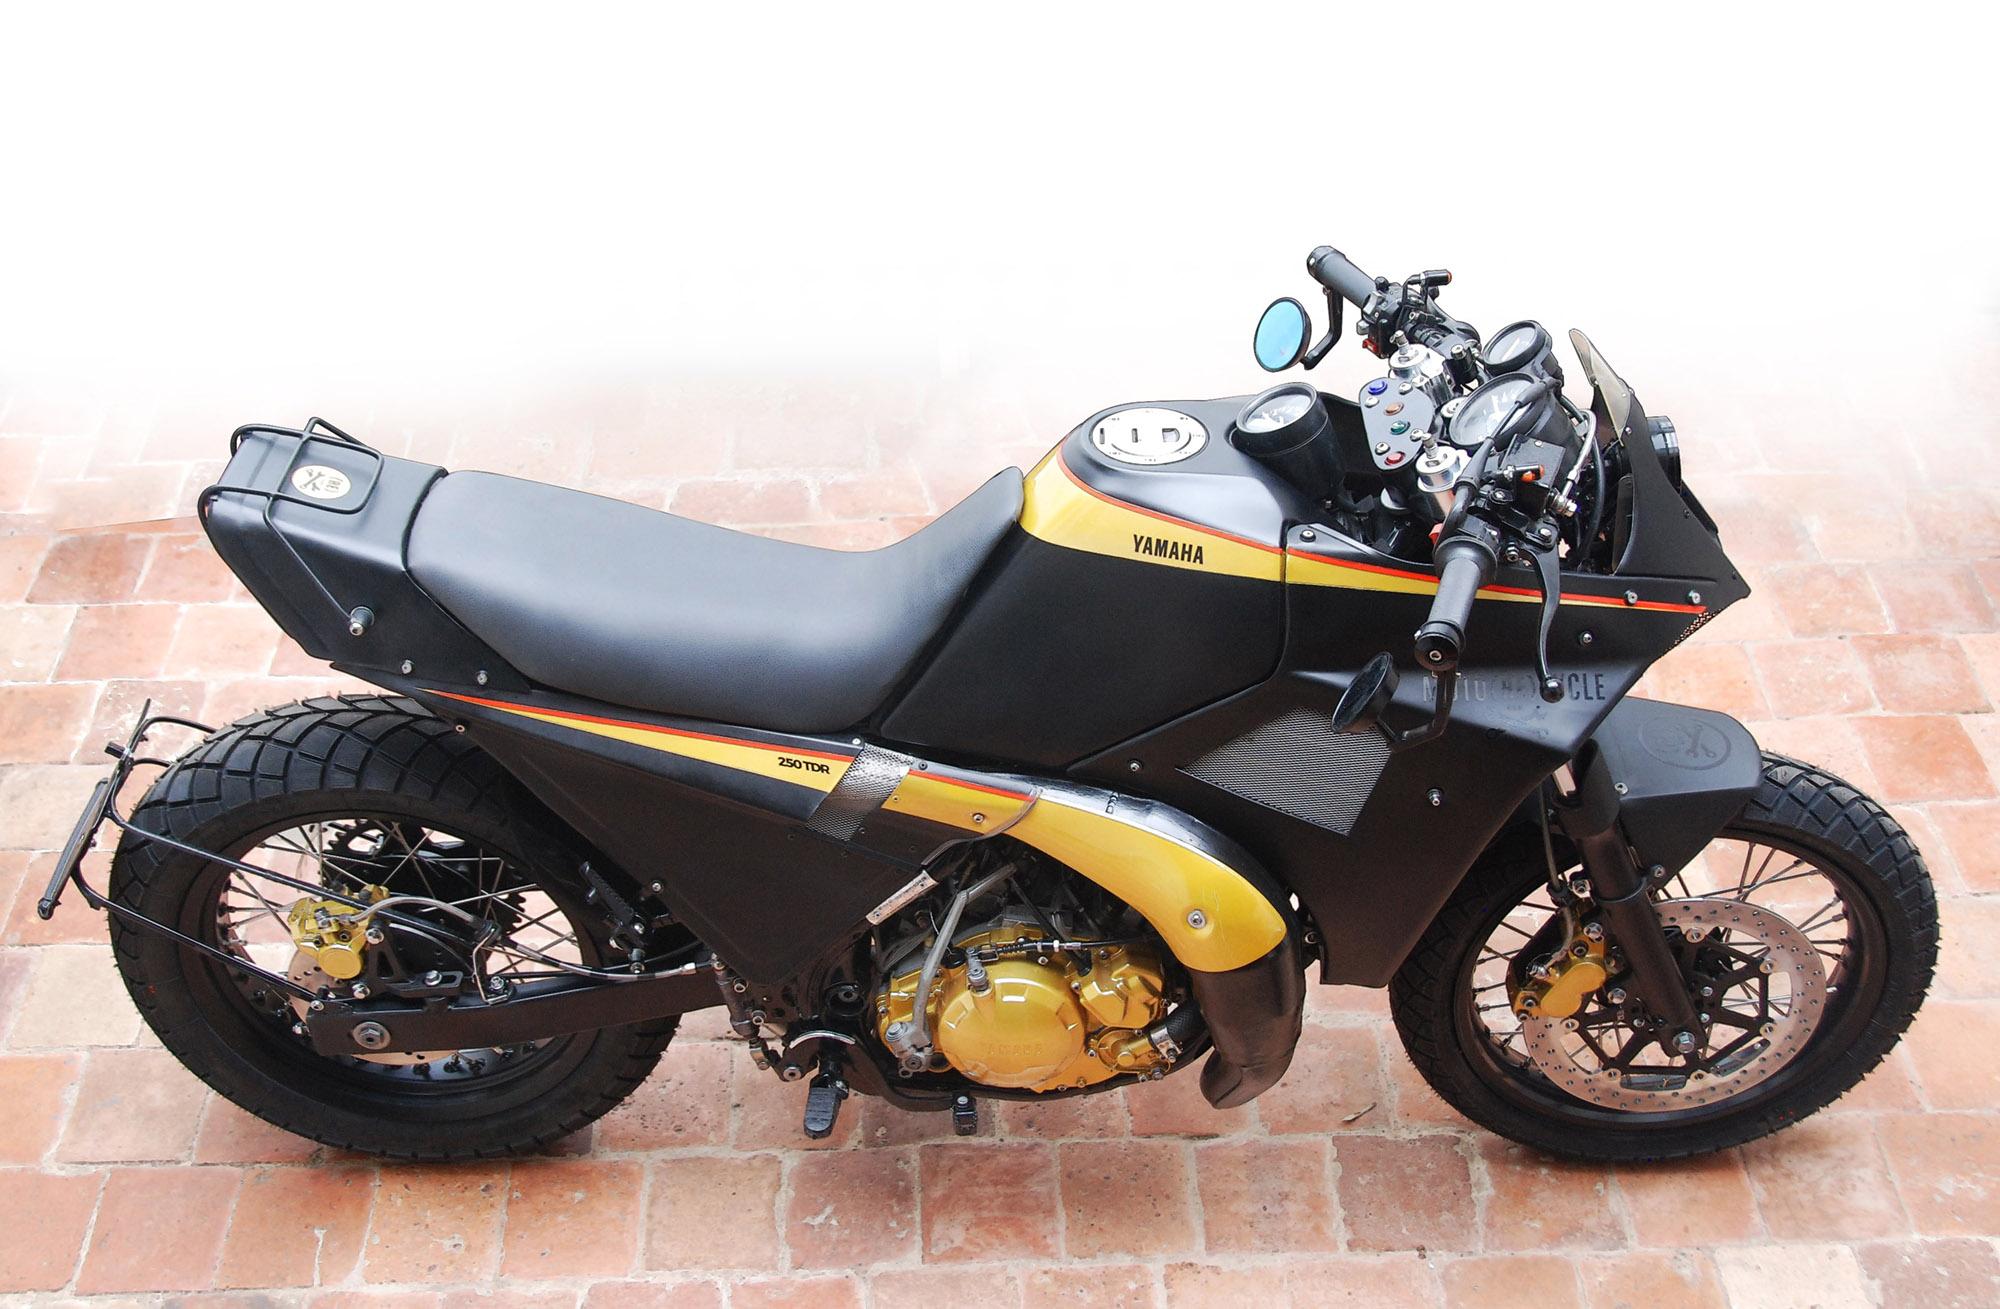 YAMAHA 250 TDR Moto(RE)cycle 2020